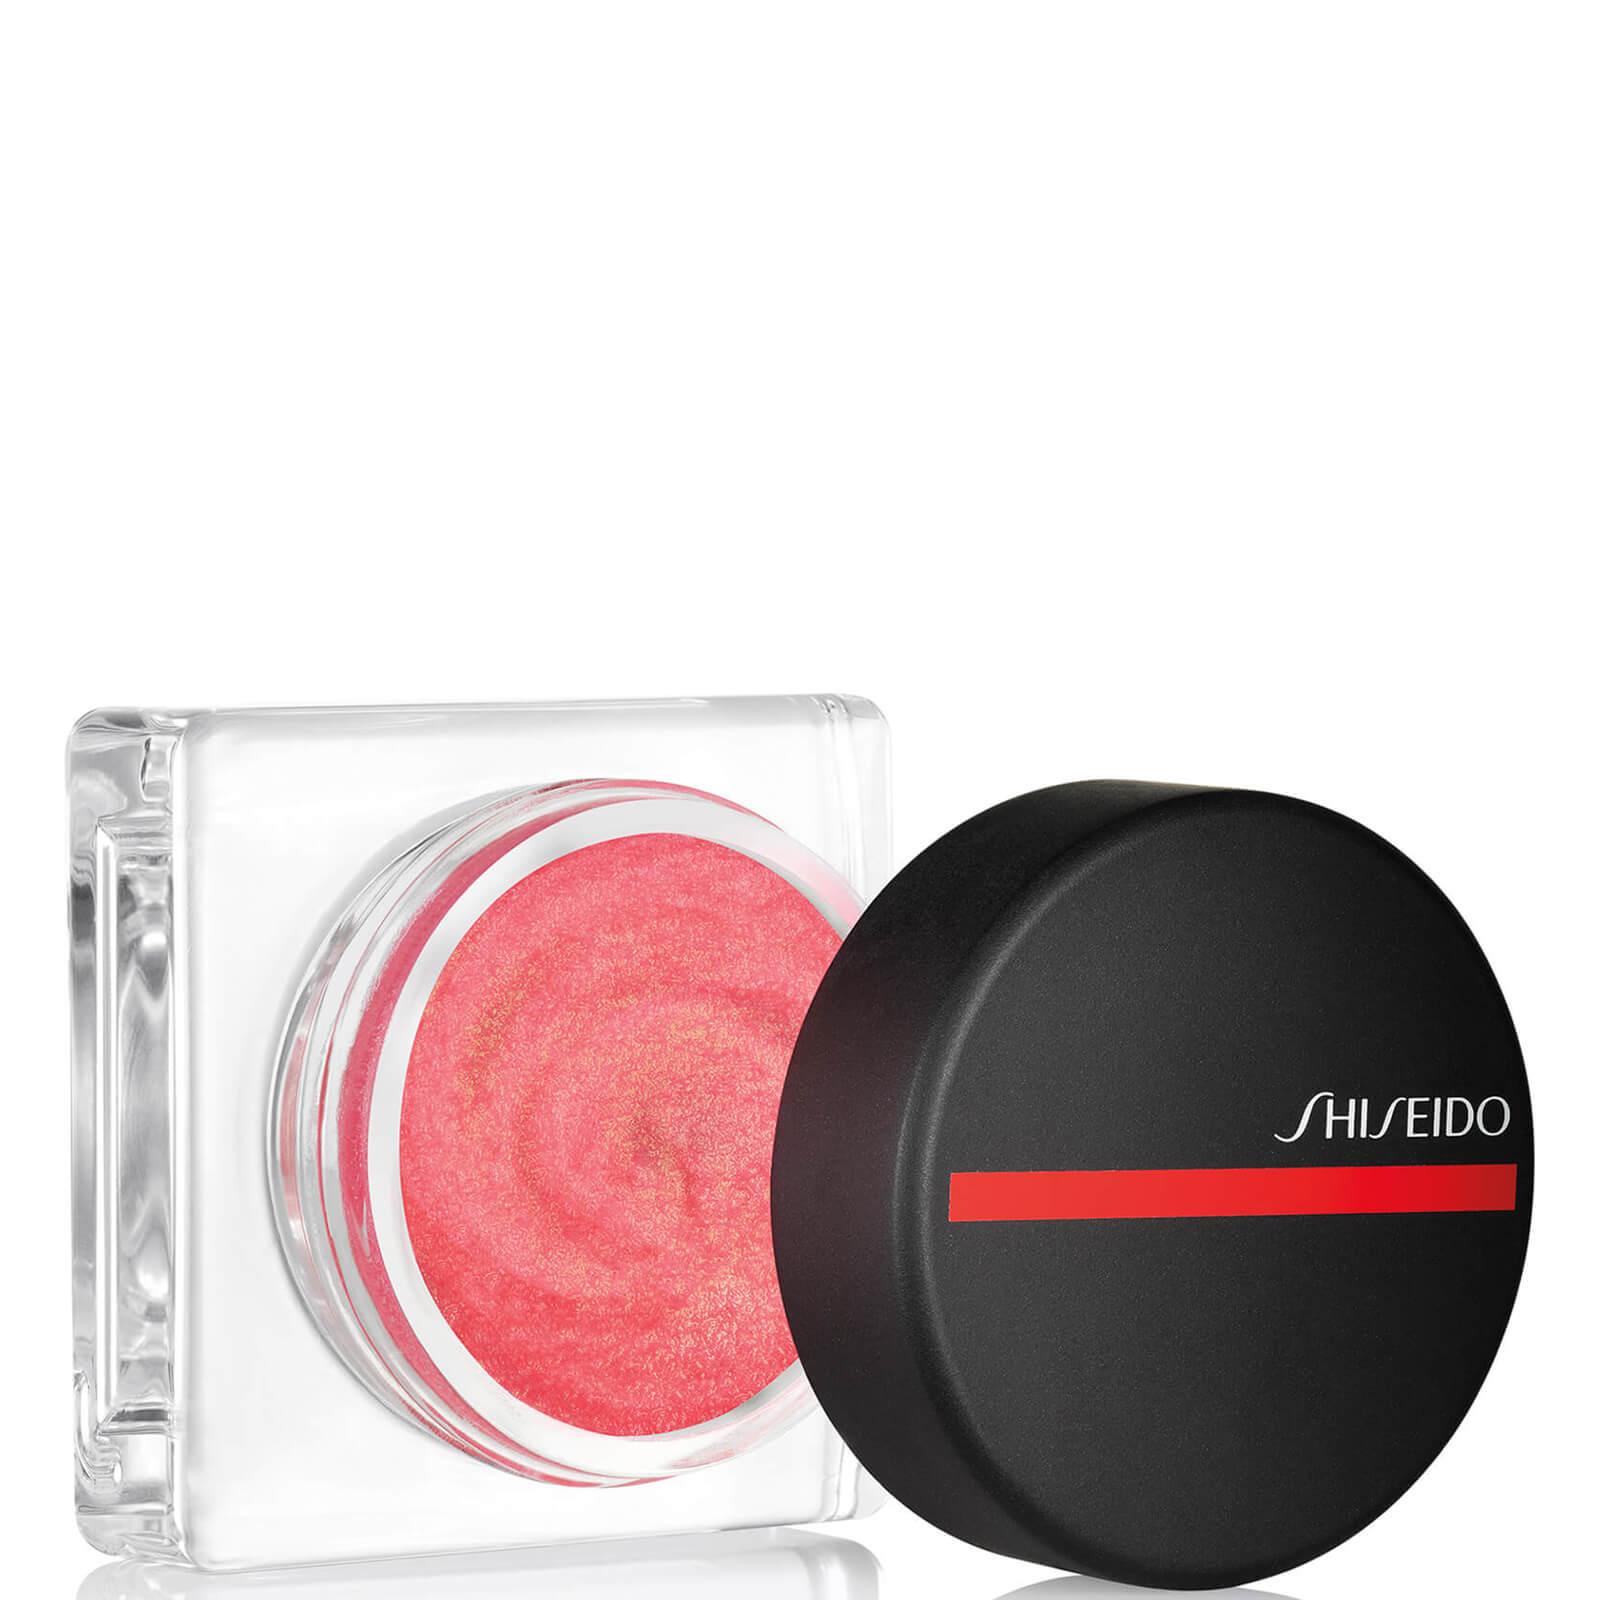 Купить Румяна-вуаль Shiseido Minimalist Whipped Powder Blush (различные оттенки) - Blush Sonoya 01